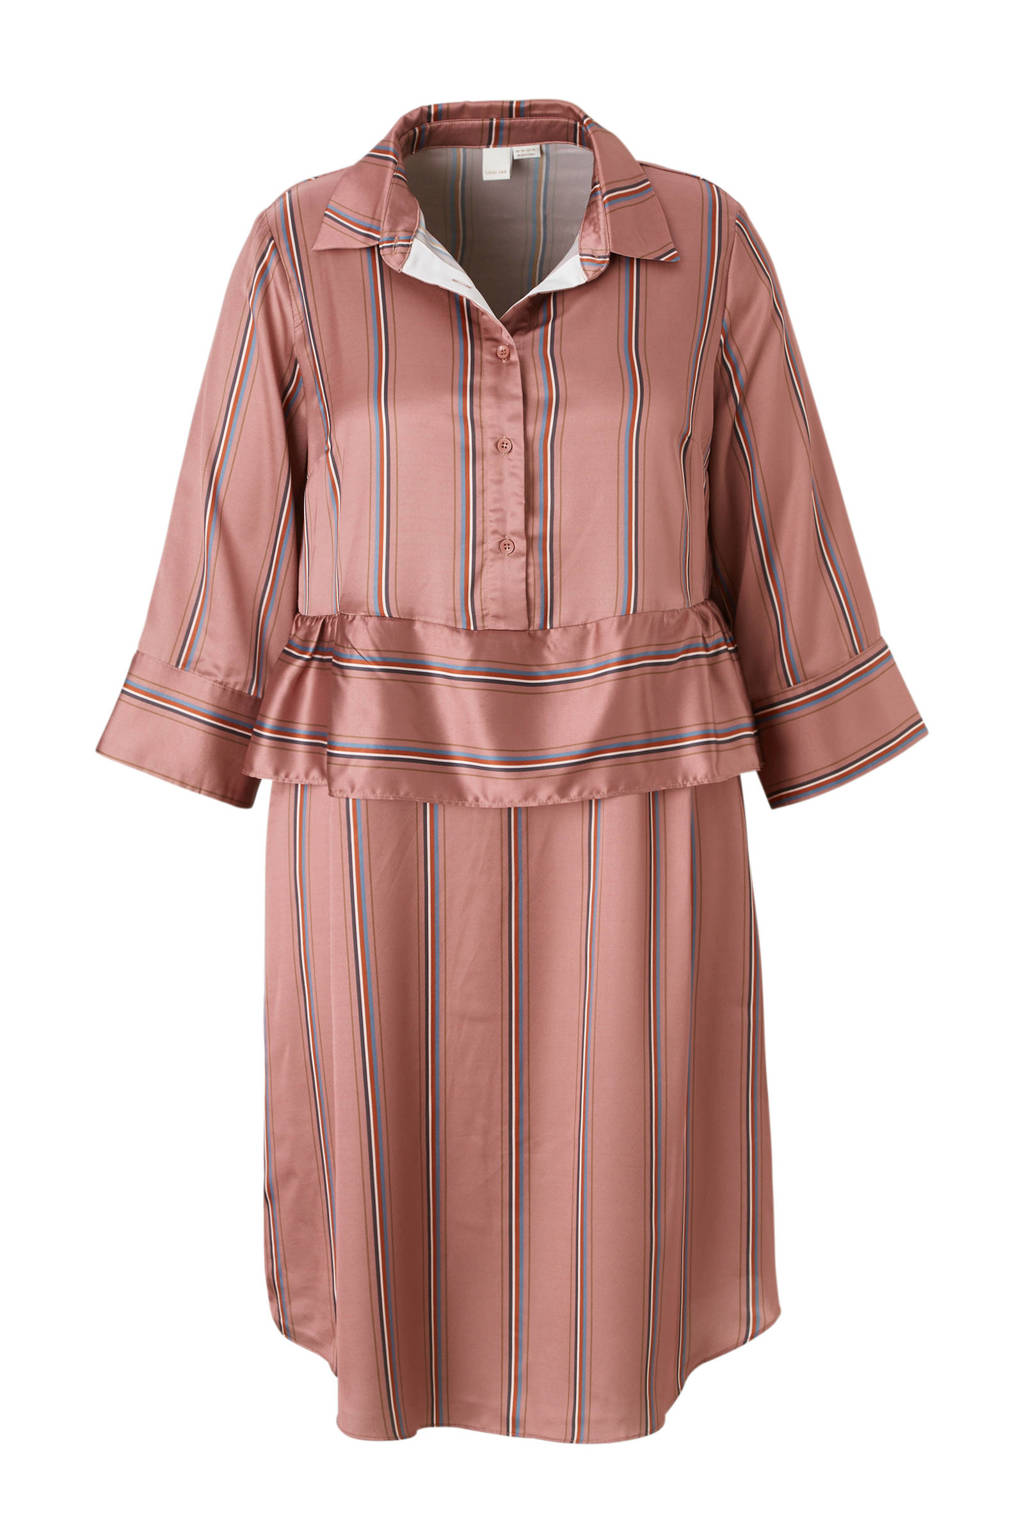 Lost Ink Plus jurk met strepen, Roze/blauw/rood